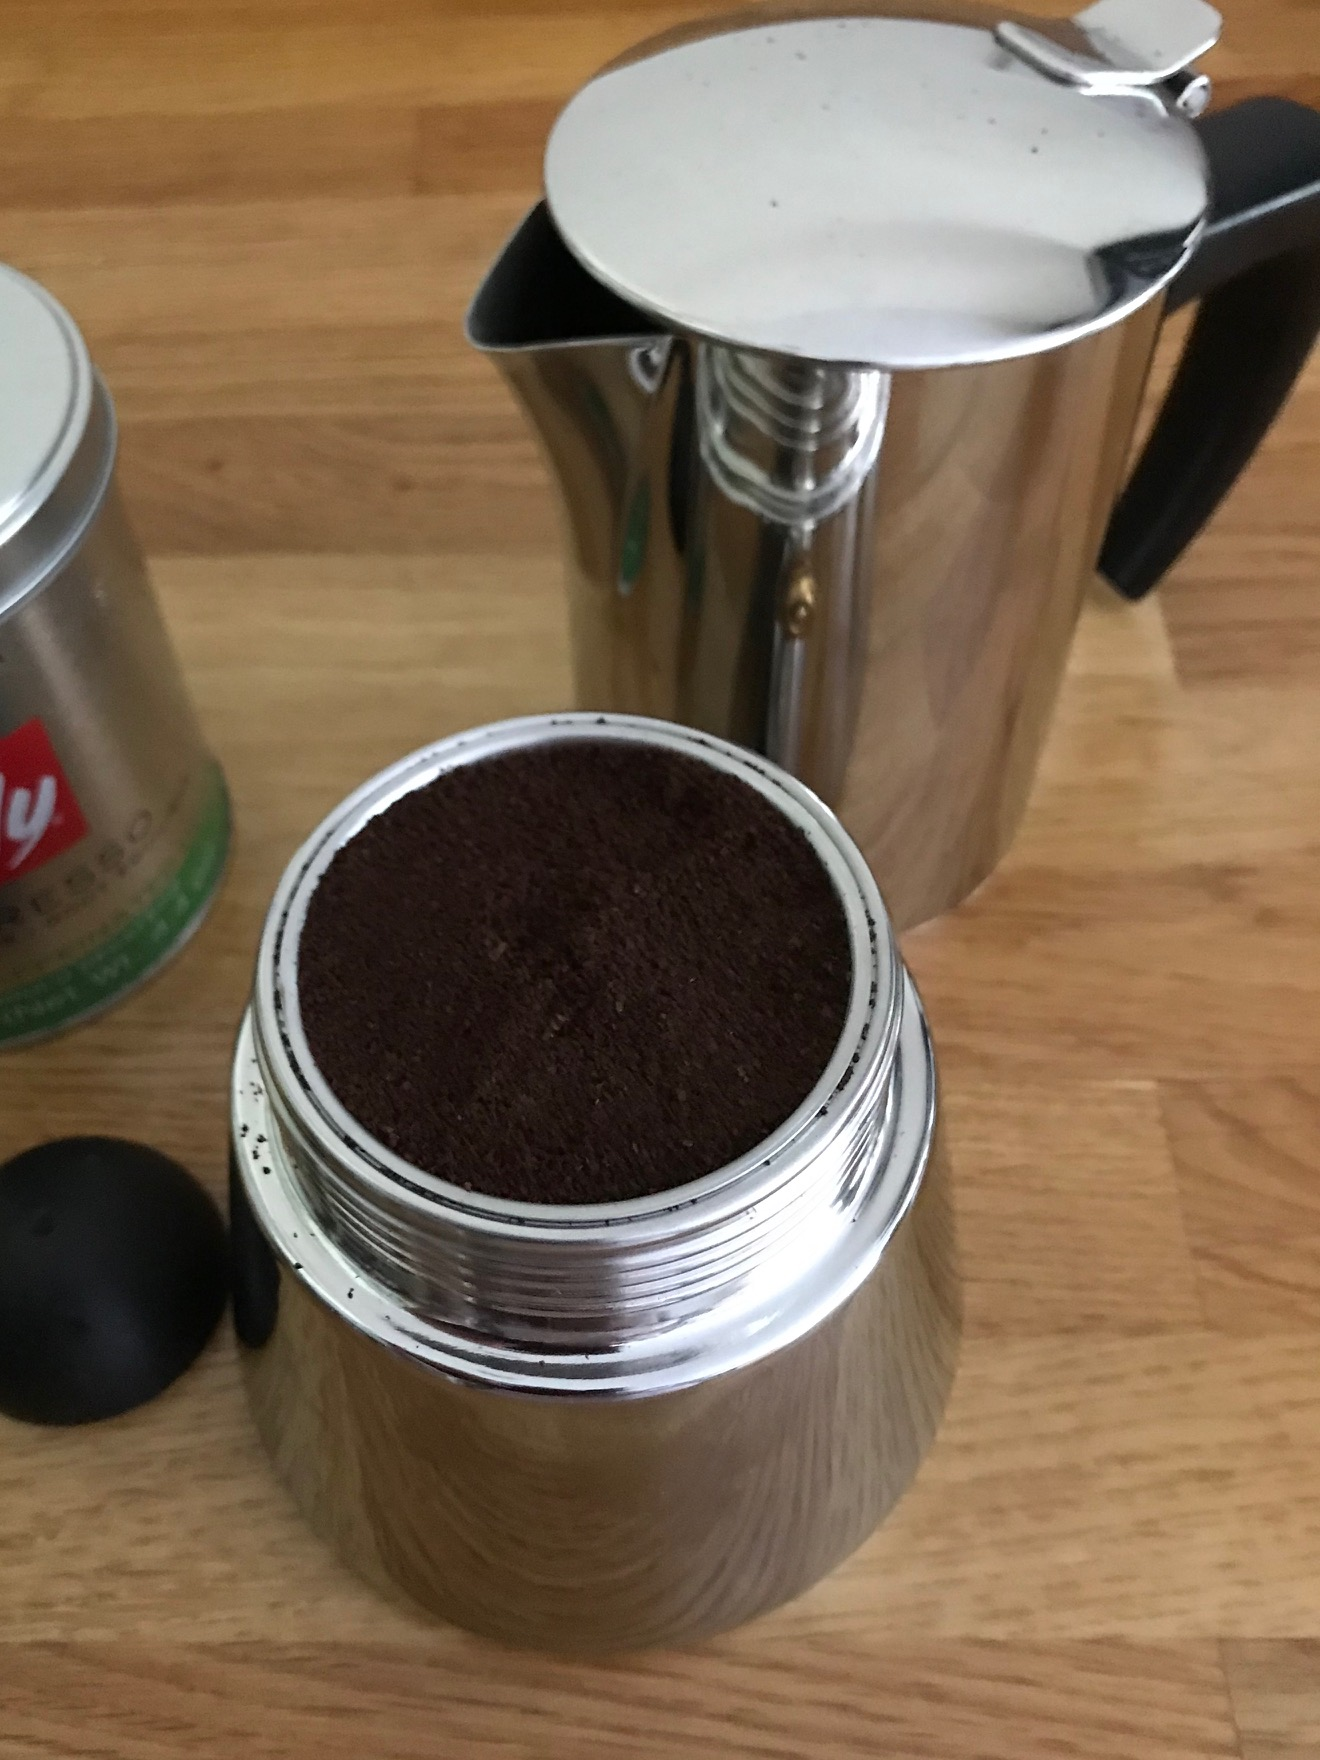 Stellar Espresso Maker